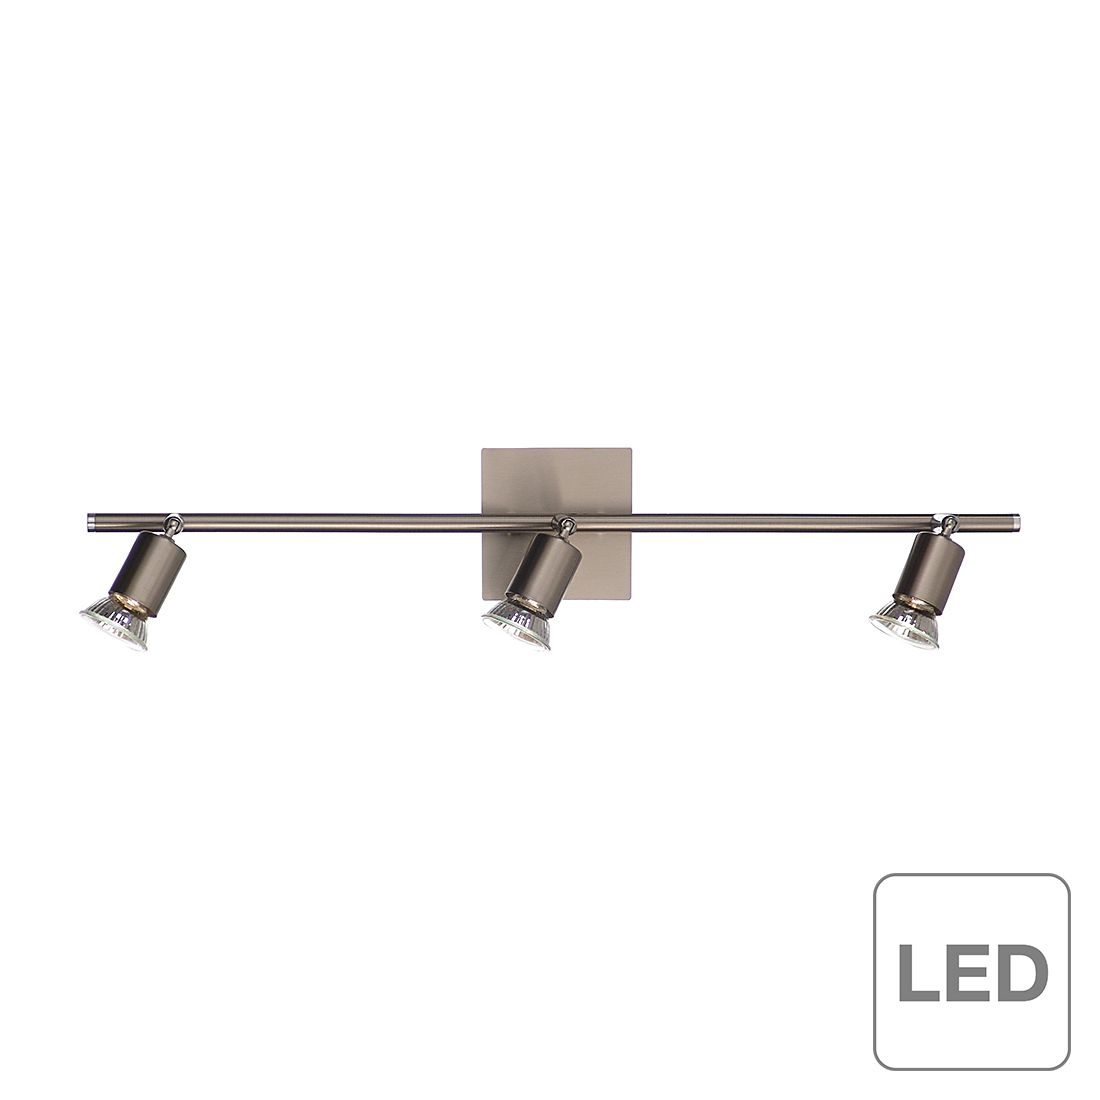 Wand-Deckenspot Vela ● 3-flammig- Economic Lighting A++